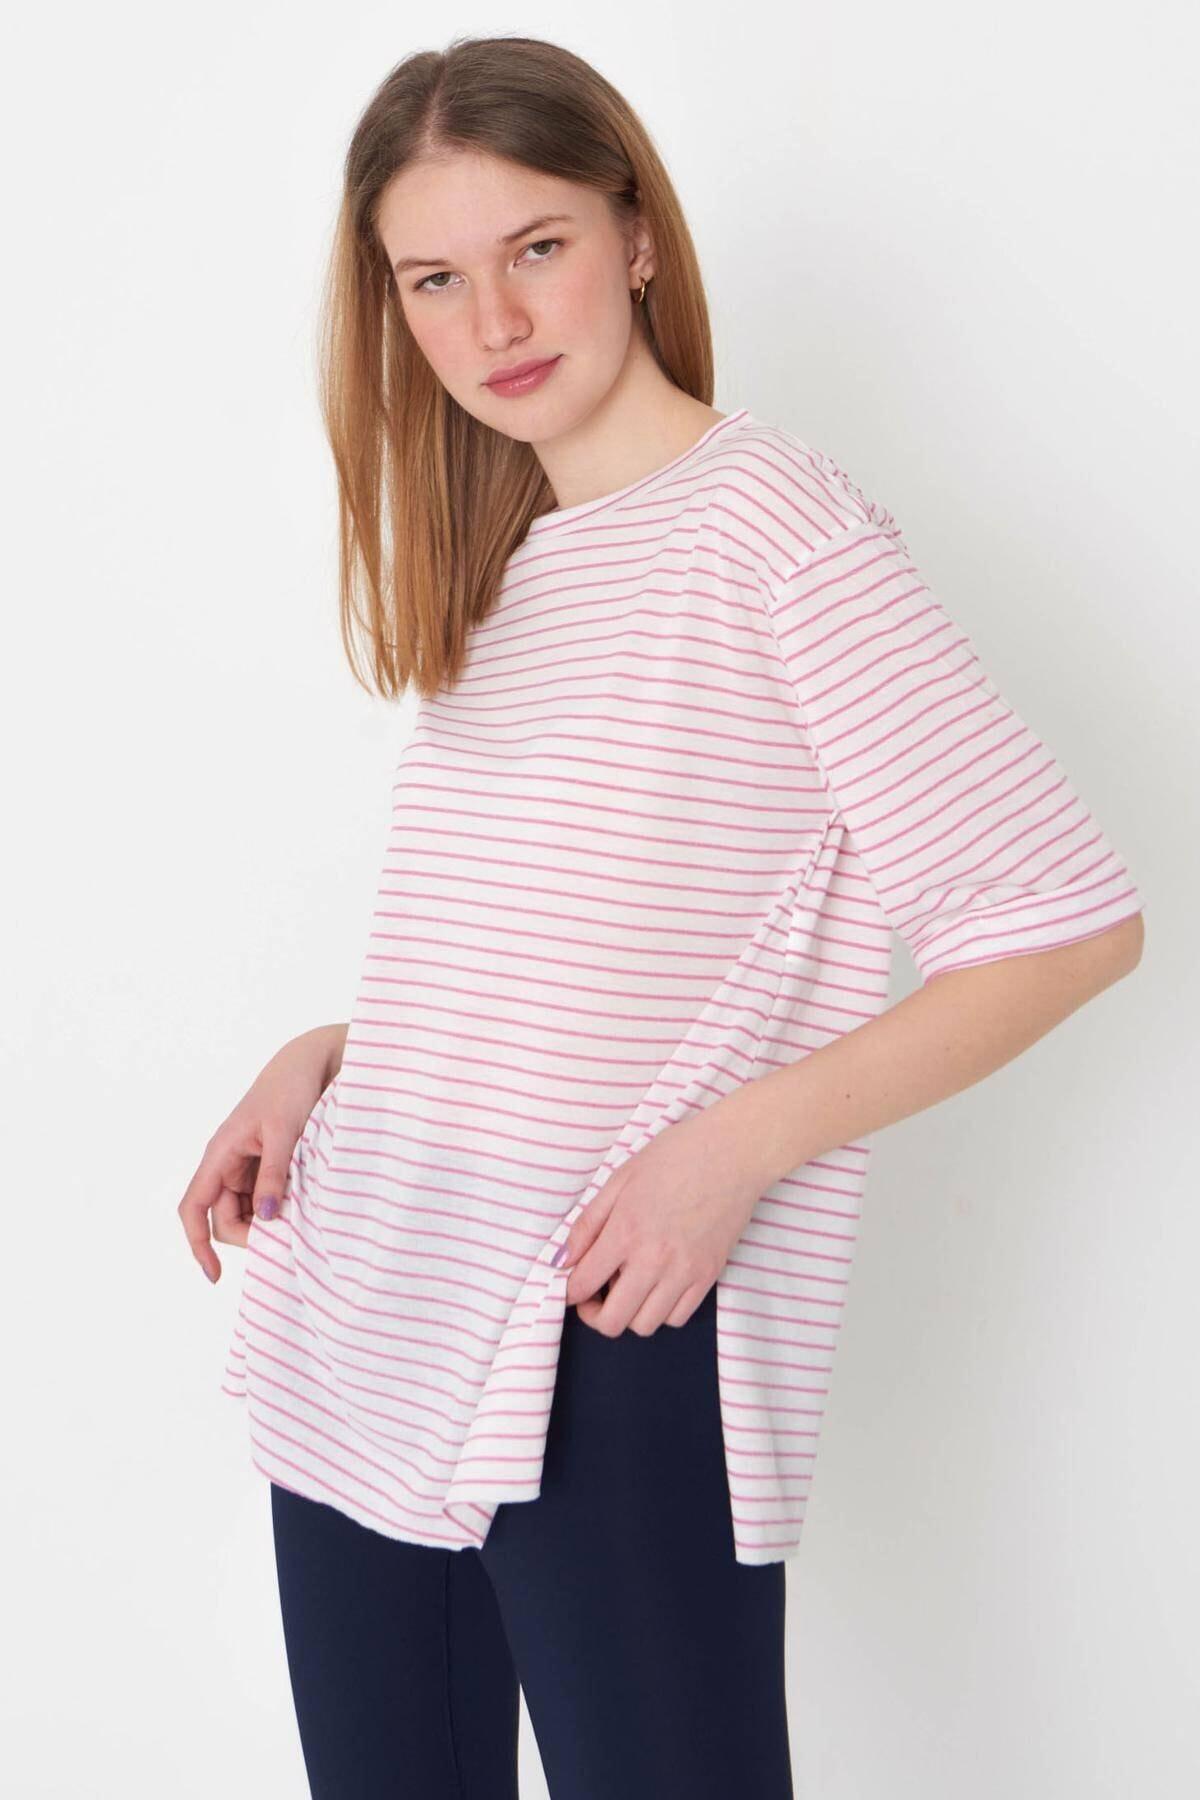 Addax Kadın Pembe Çizgili T-Shirt P6687 - S13 Adx-0000023923